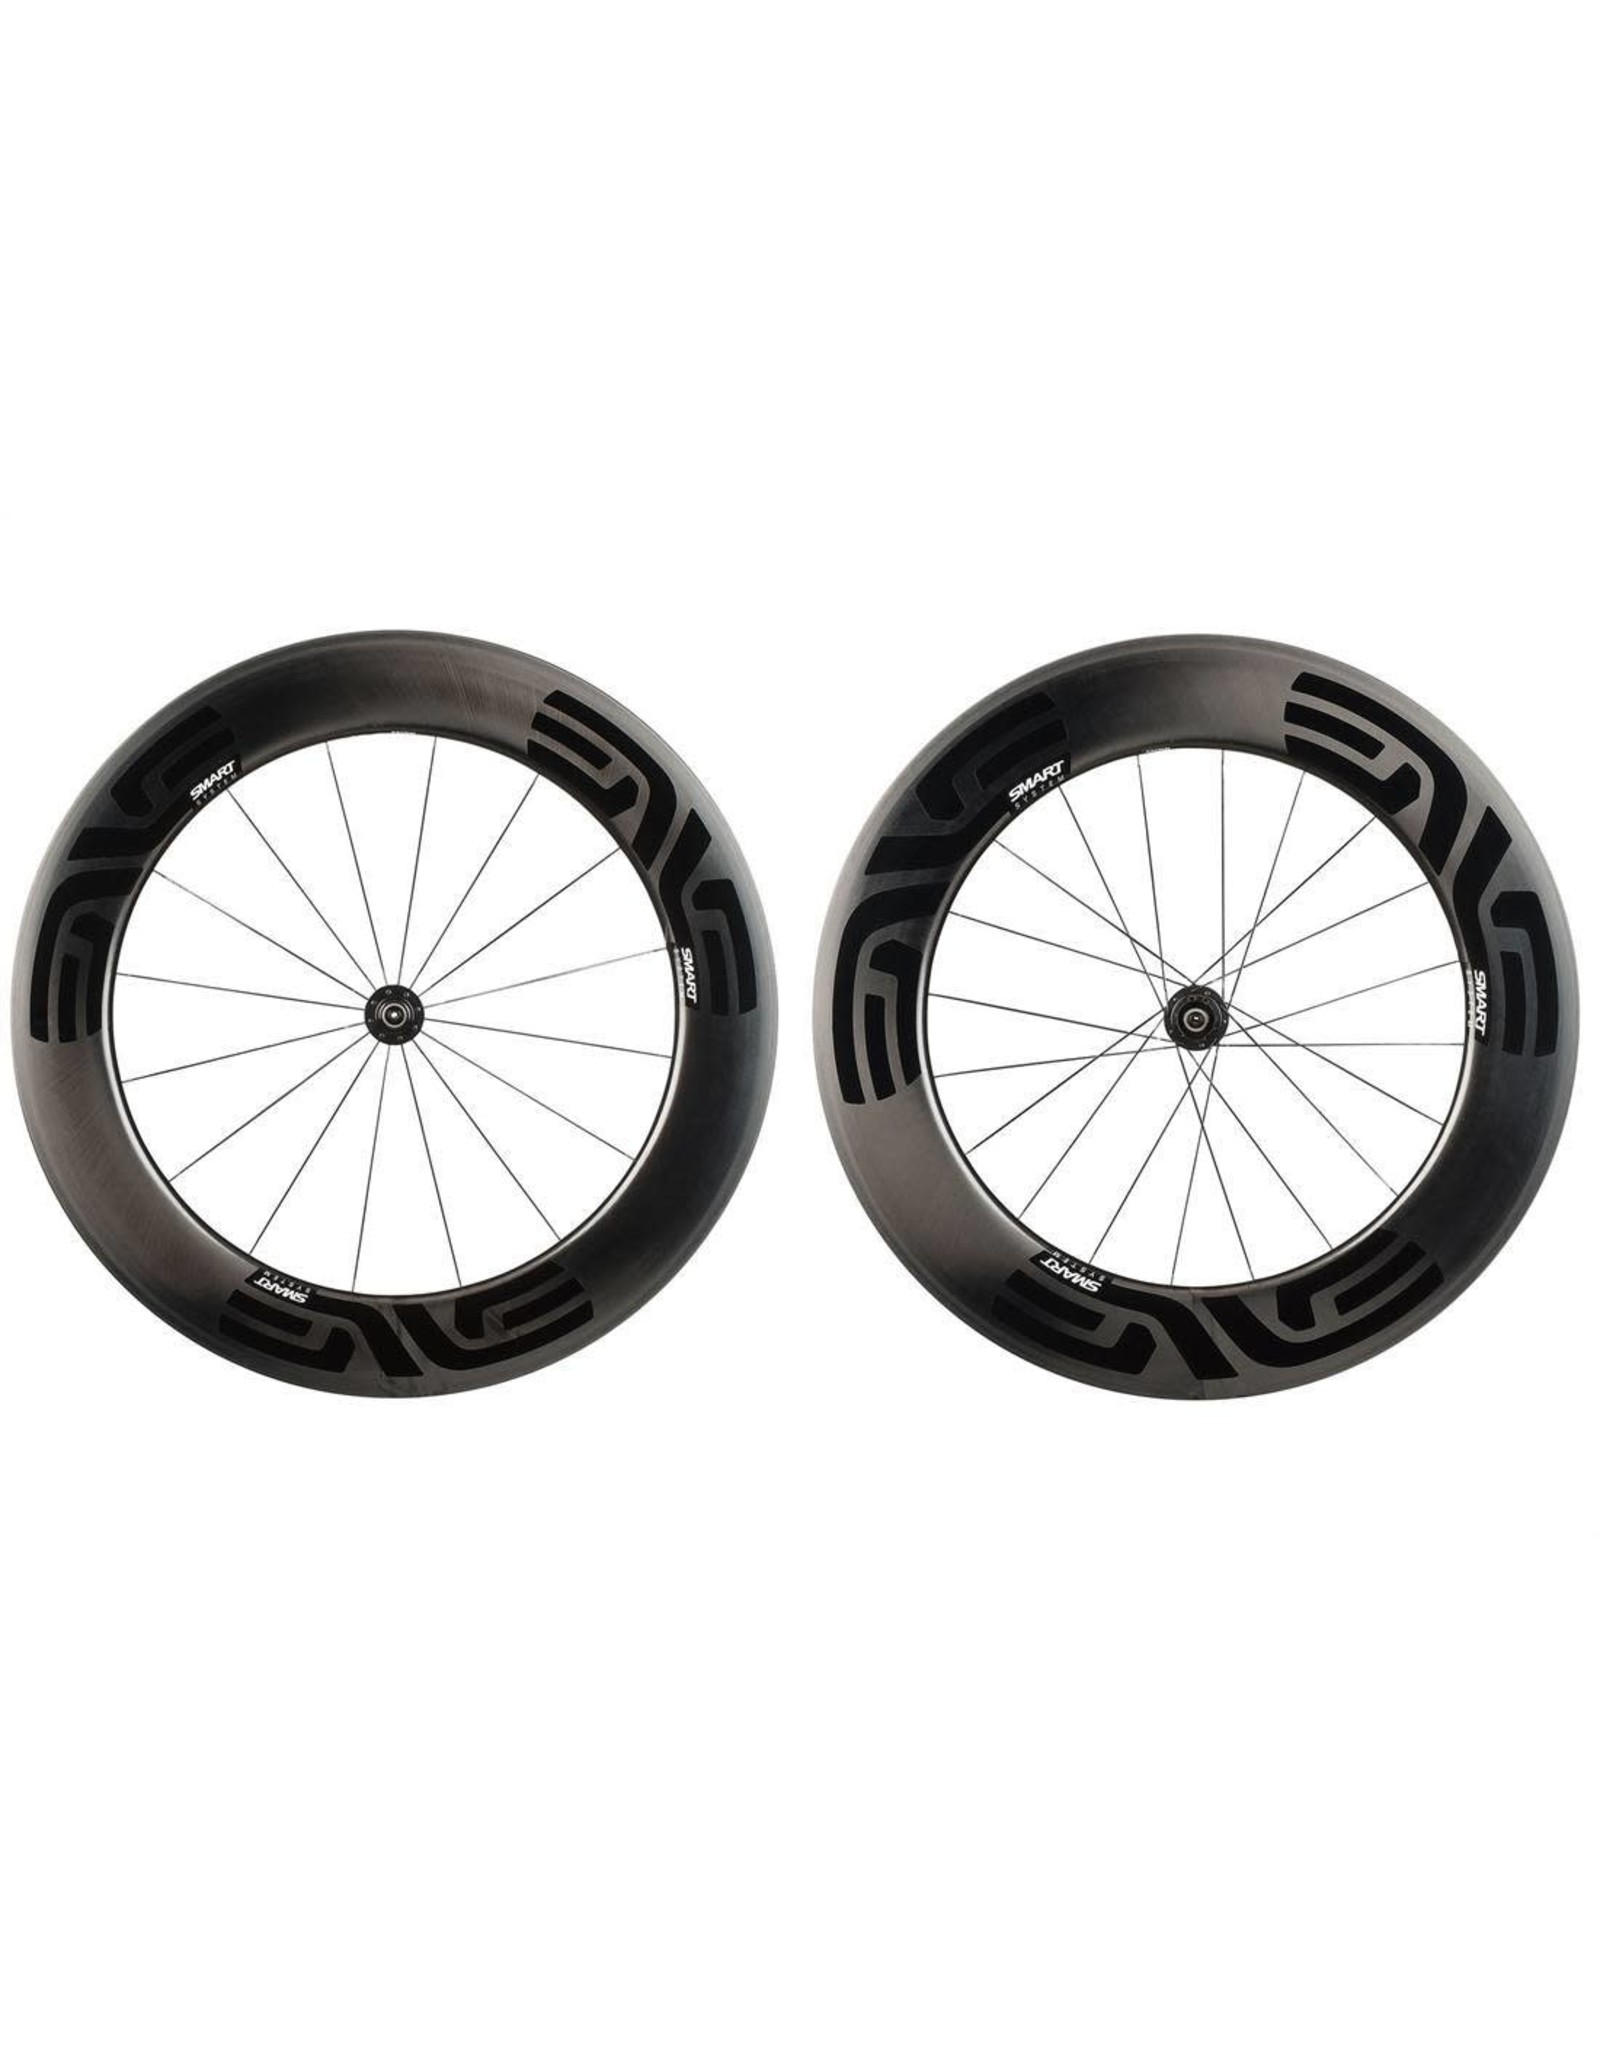 ENVE Composites ENVE SES 8.9 Tubular Wheelset - DT Swiss 240 (Shimano/SRAM)